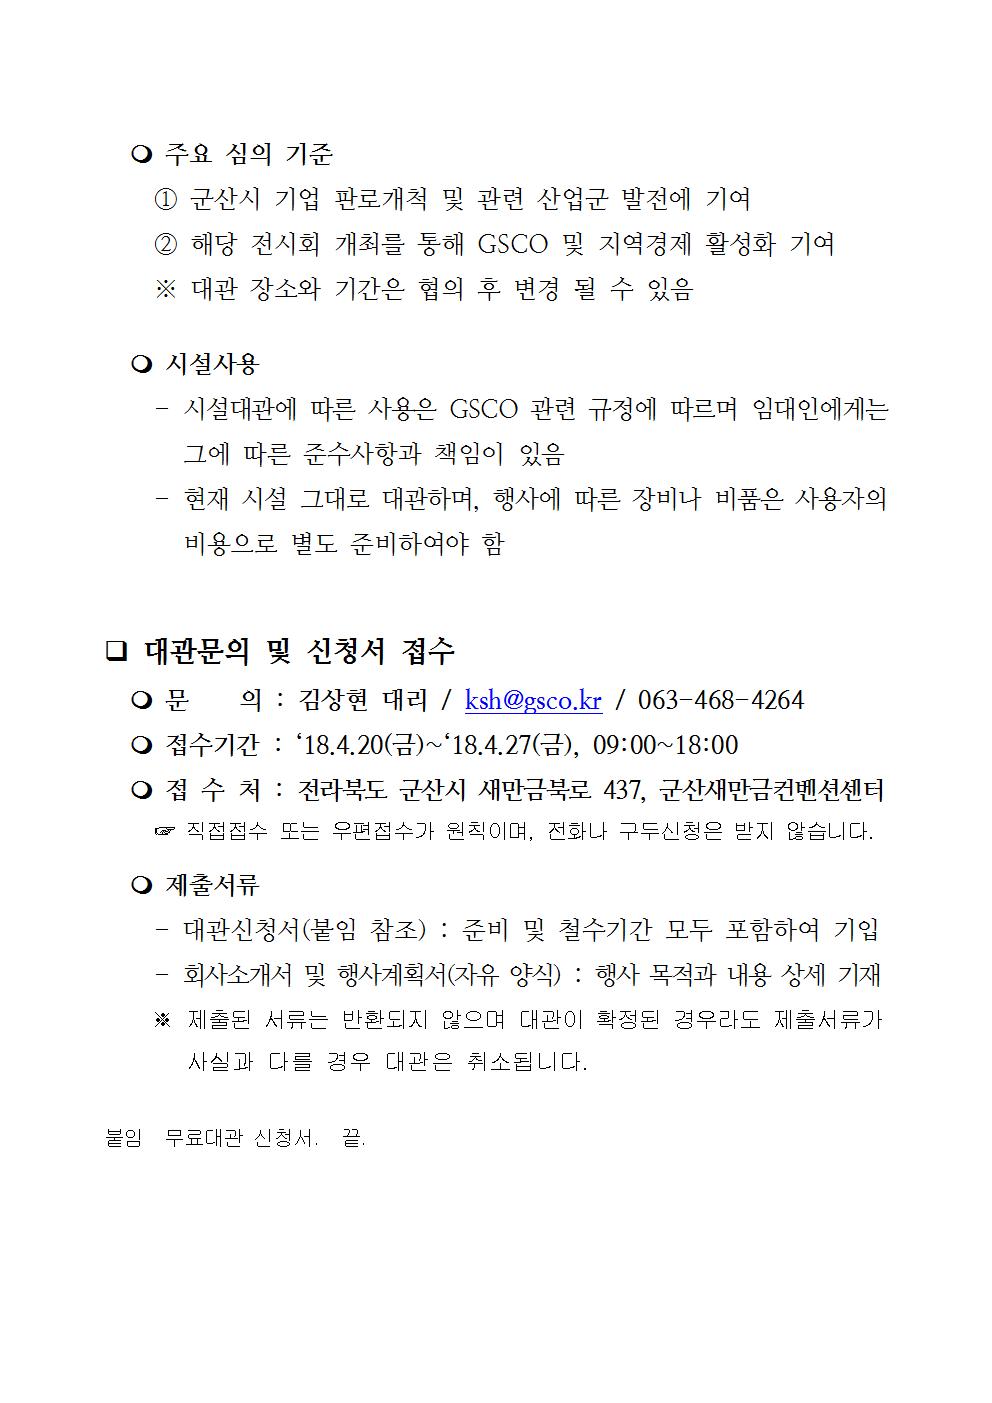 2018 GSCO 유망전시회 추가 모집 공고(안)002